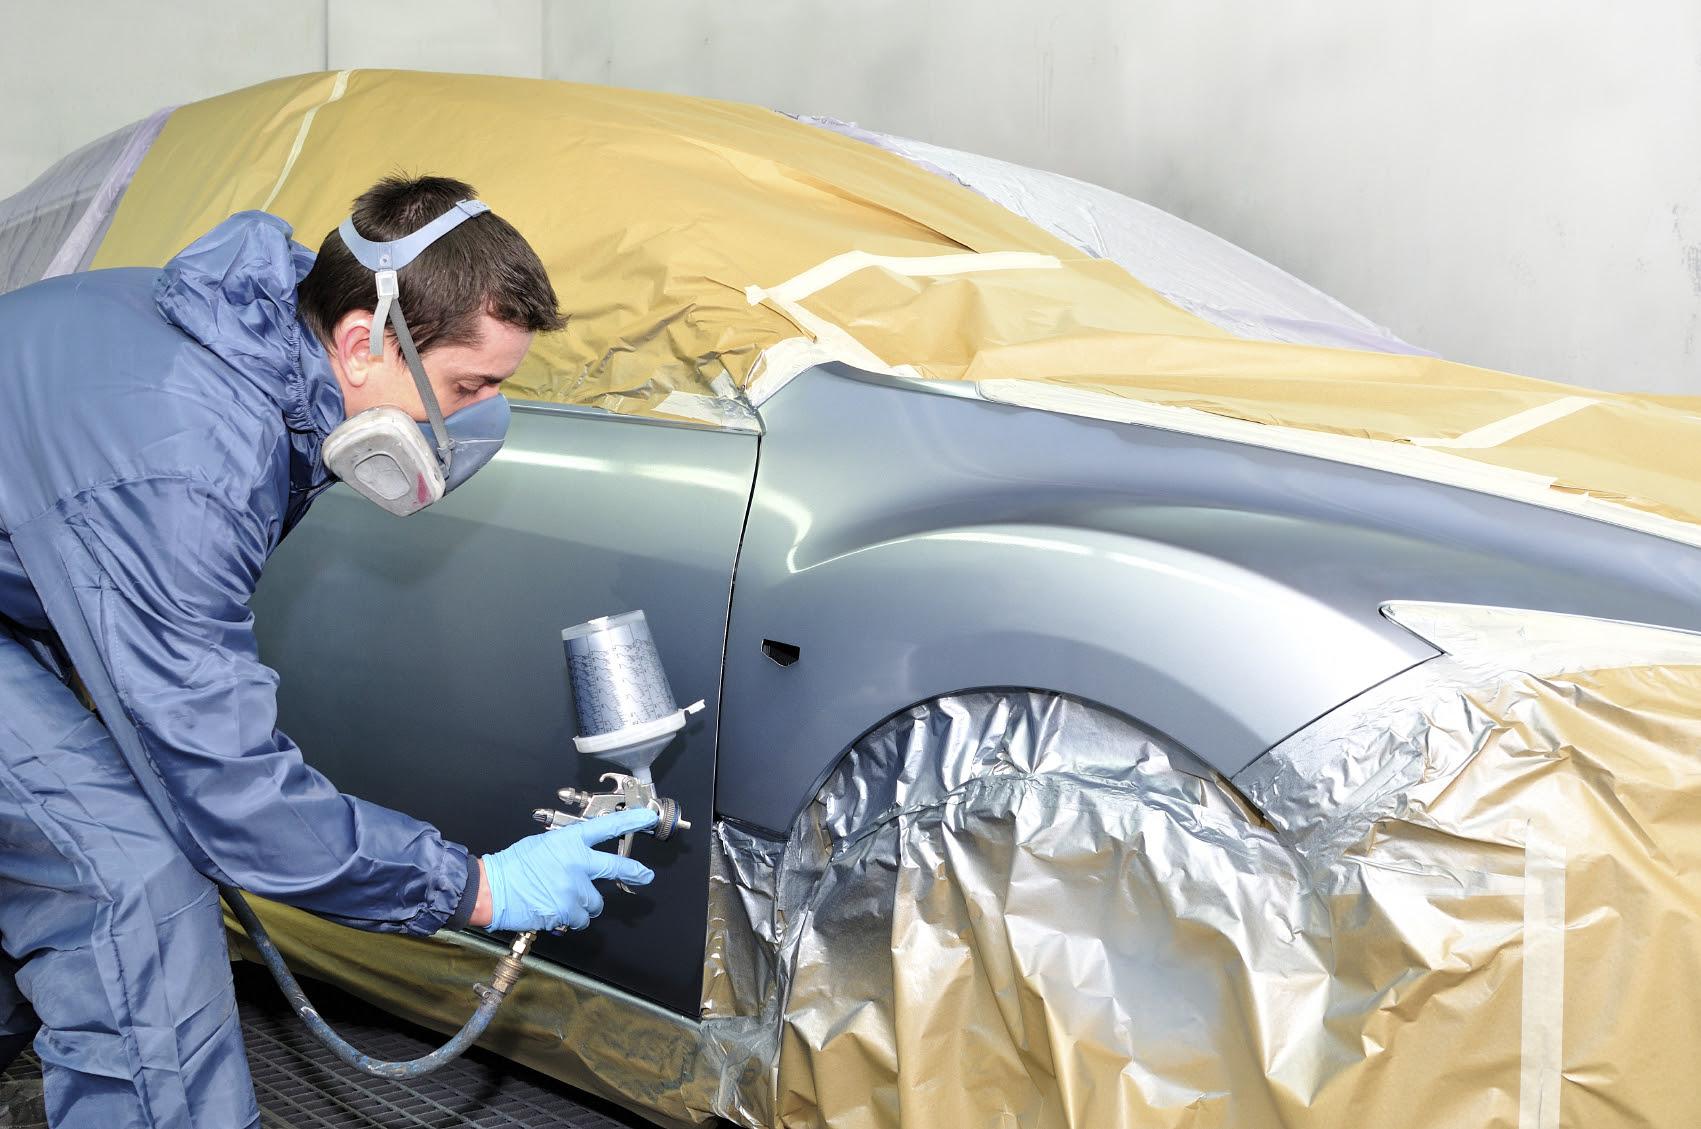 Car Paint Job Tempe Arizona - DIY Auto Paint Tips